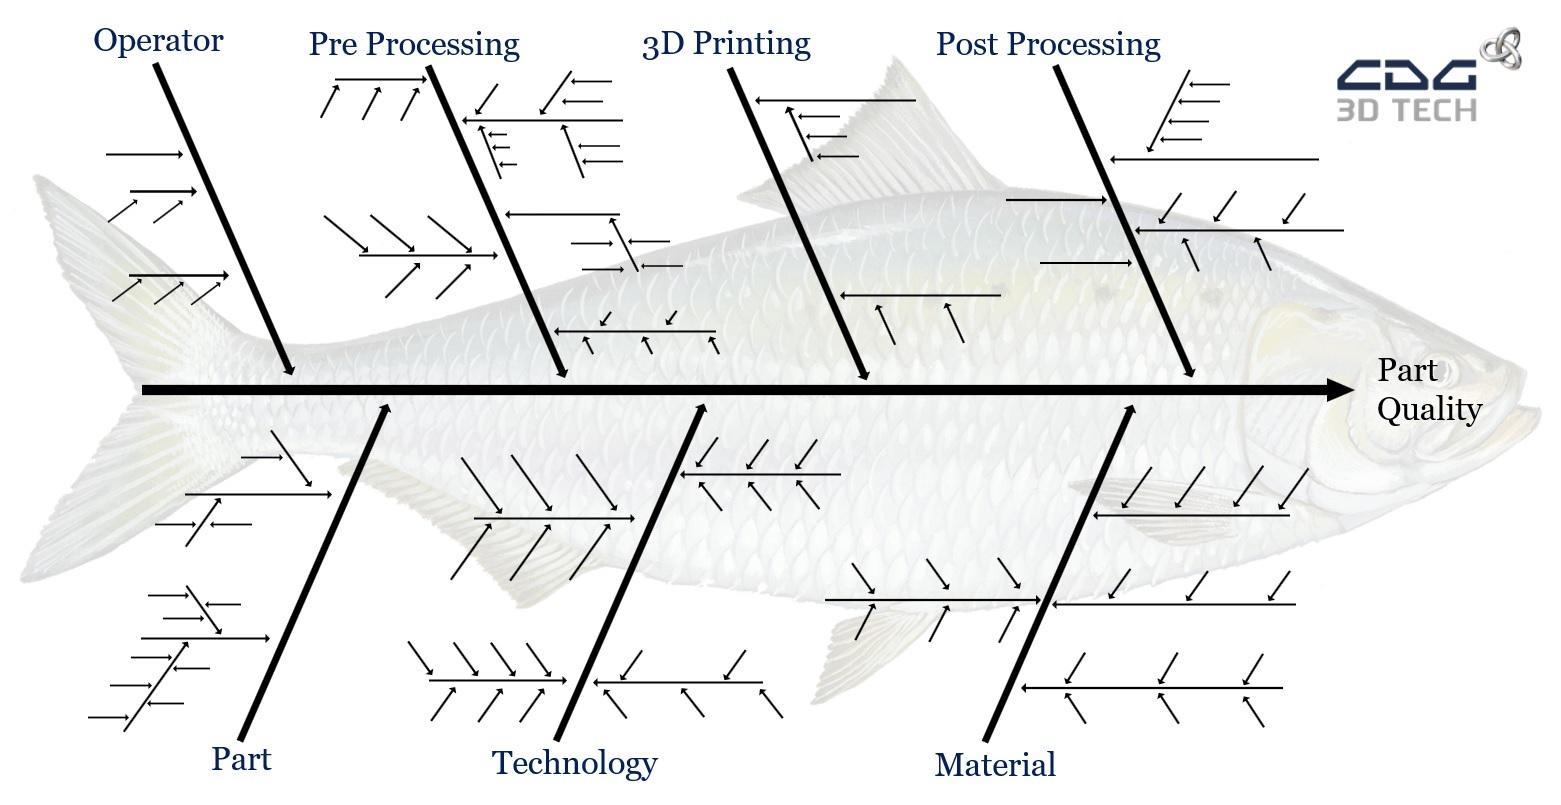 Ishikawa Fishbone Diagram 3D Printing Technology bones only